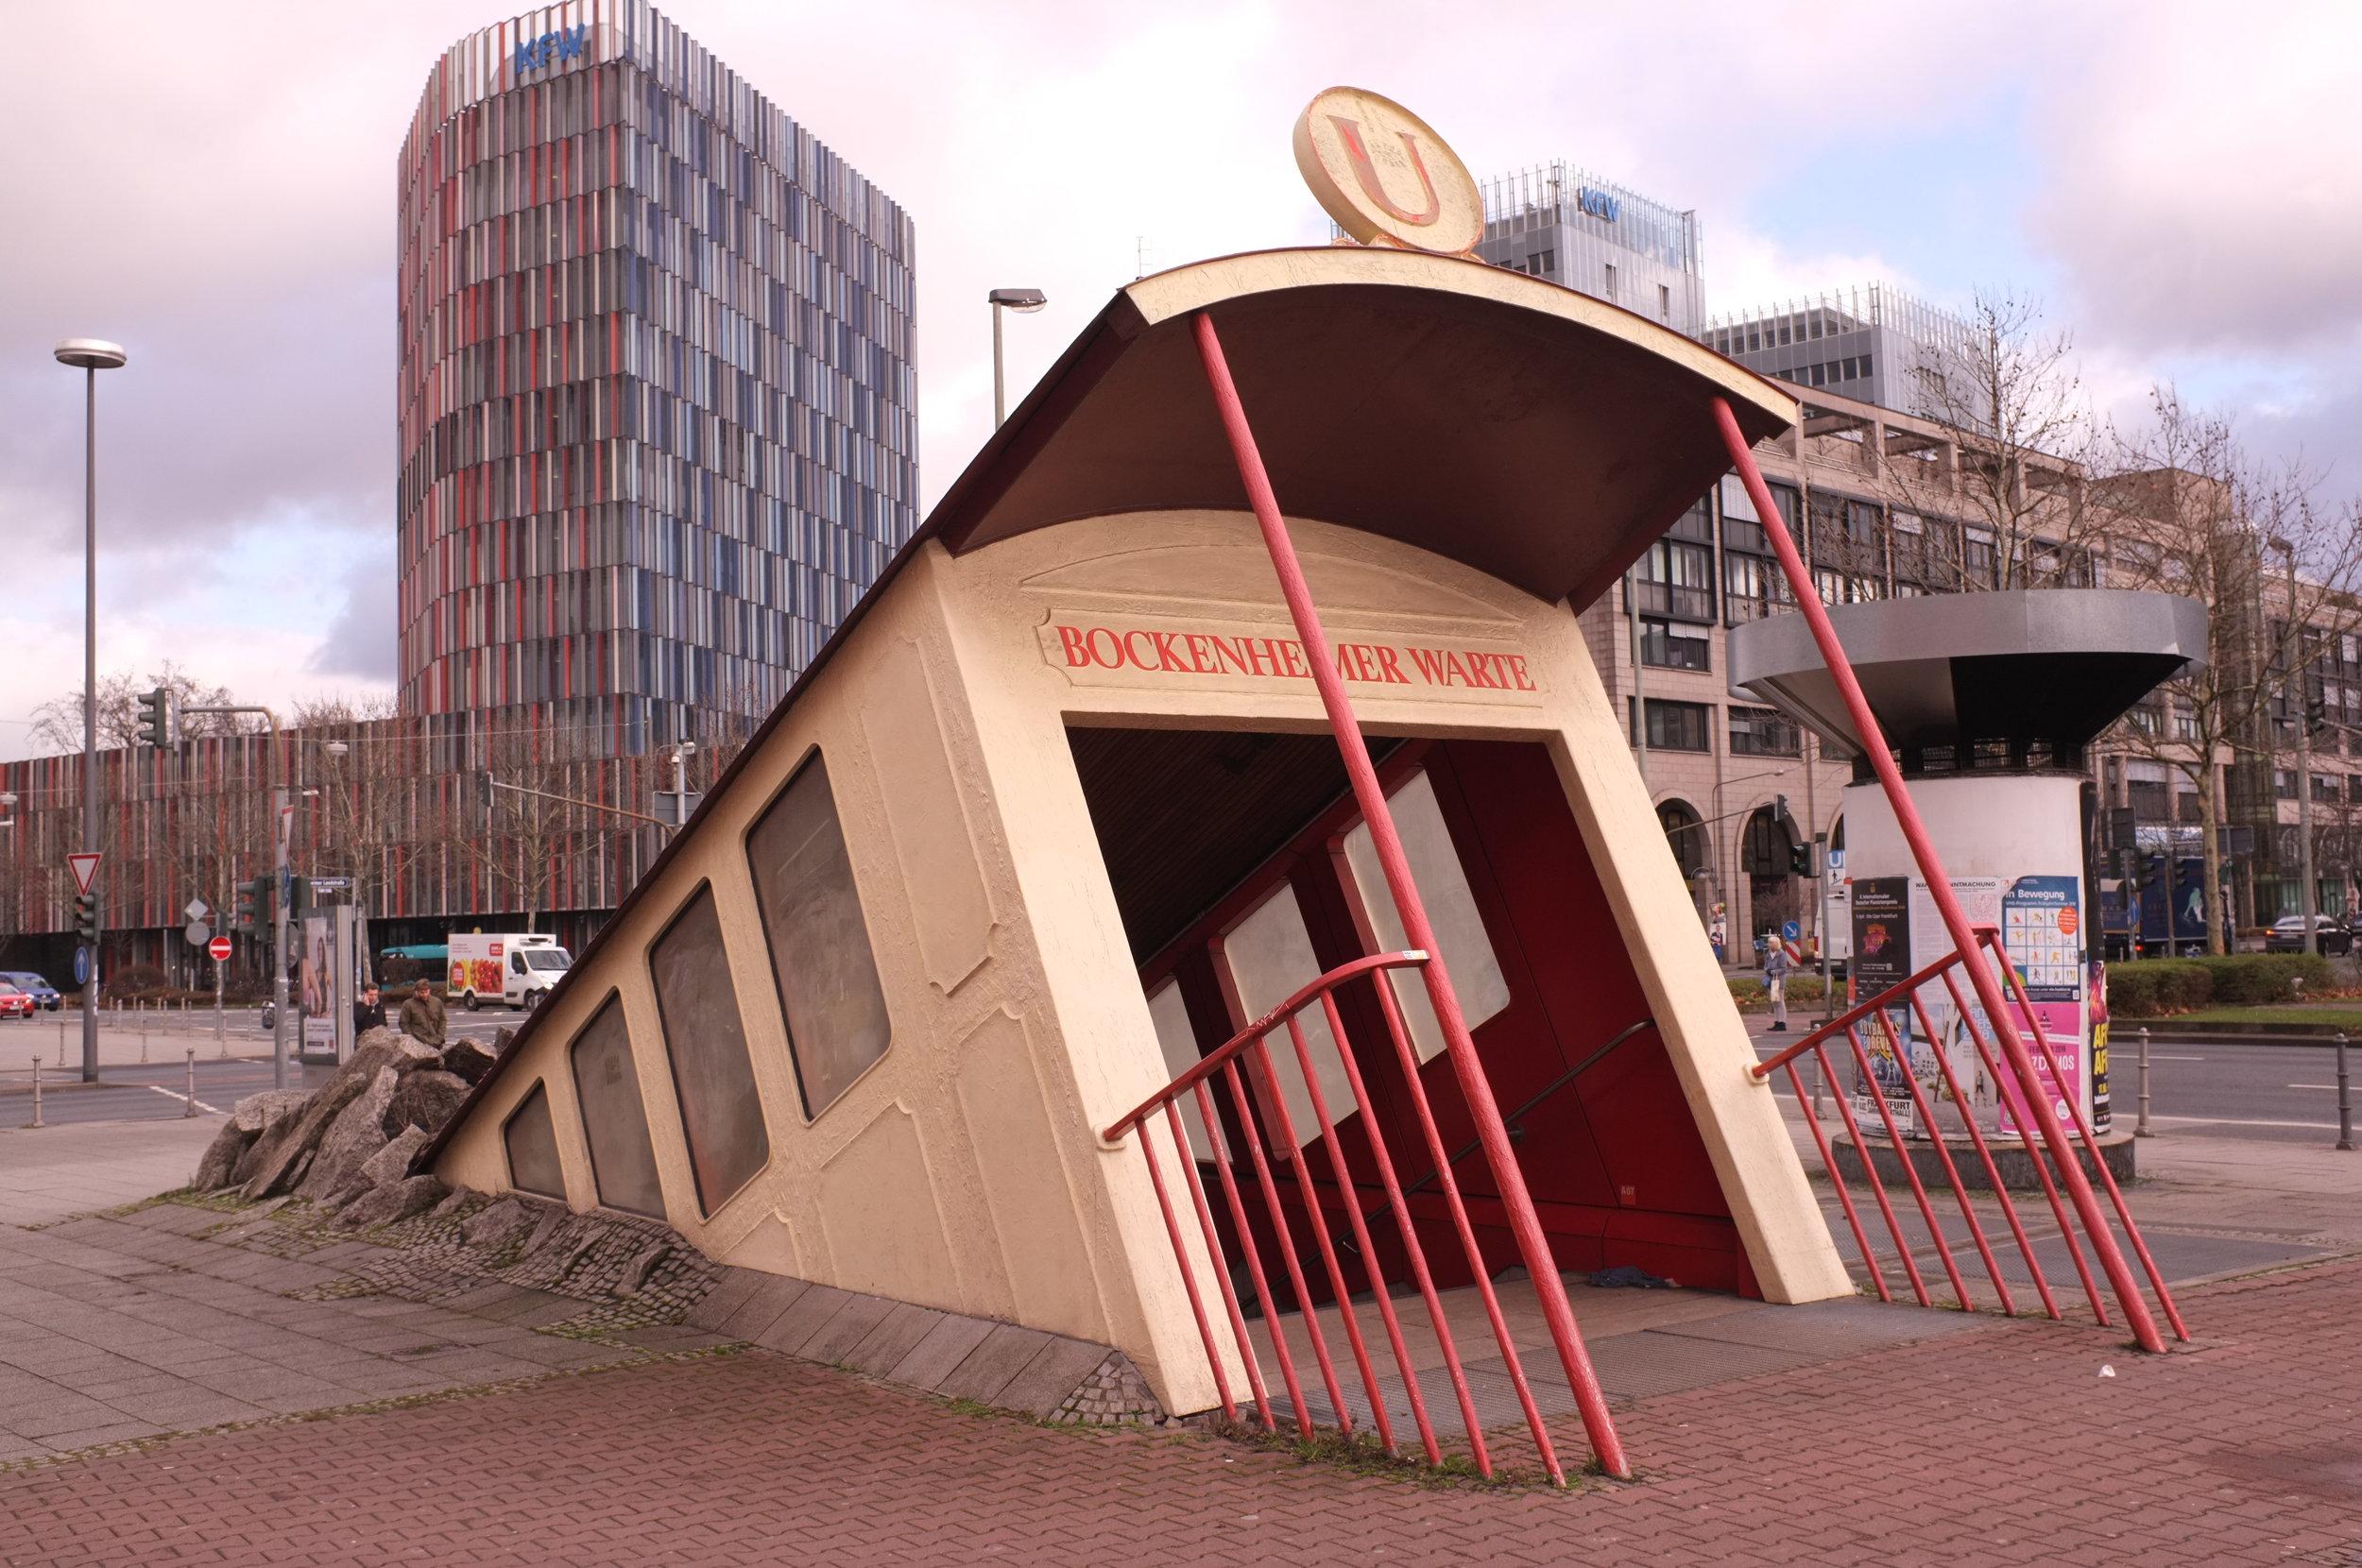 Subway entrance Bockenheimer Warte